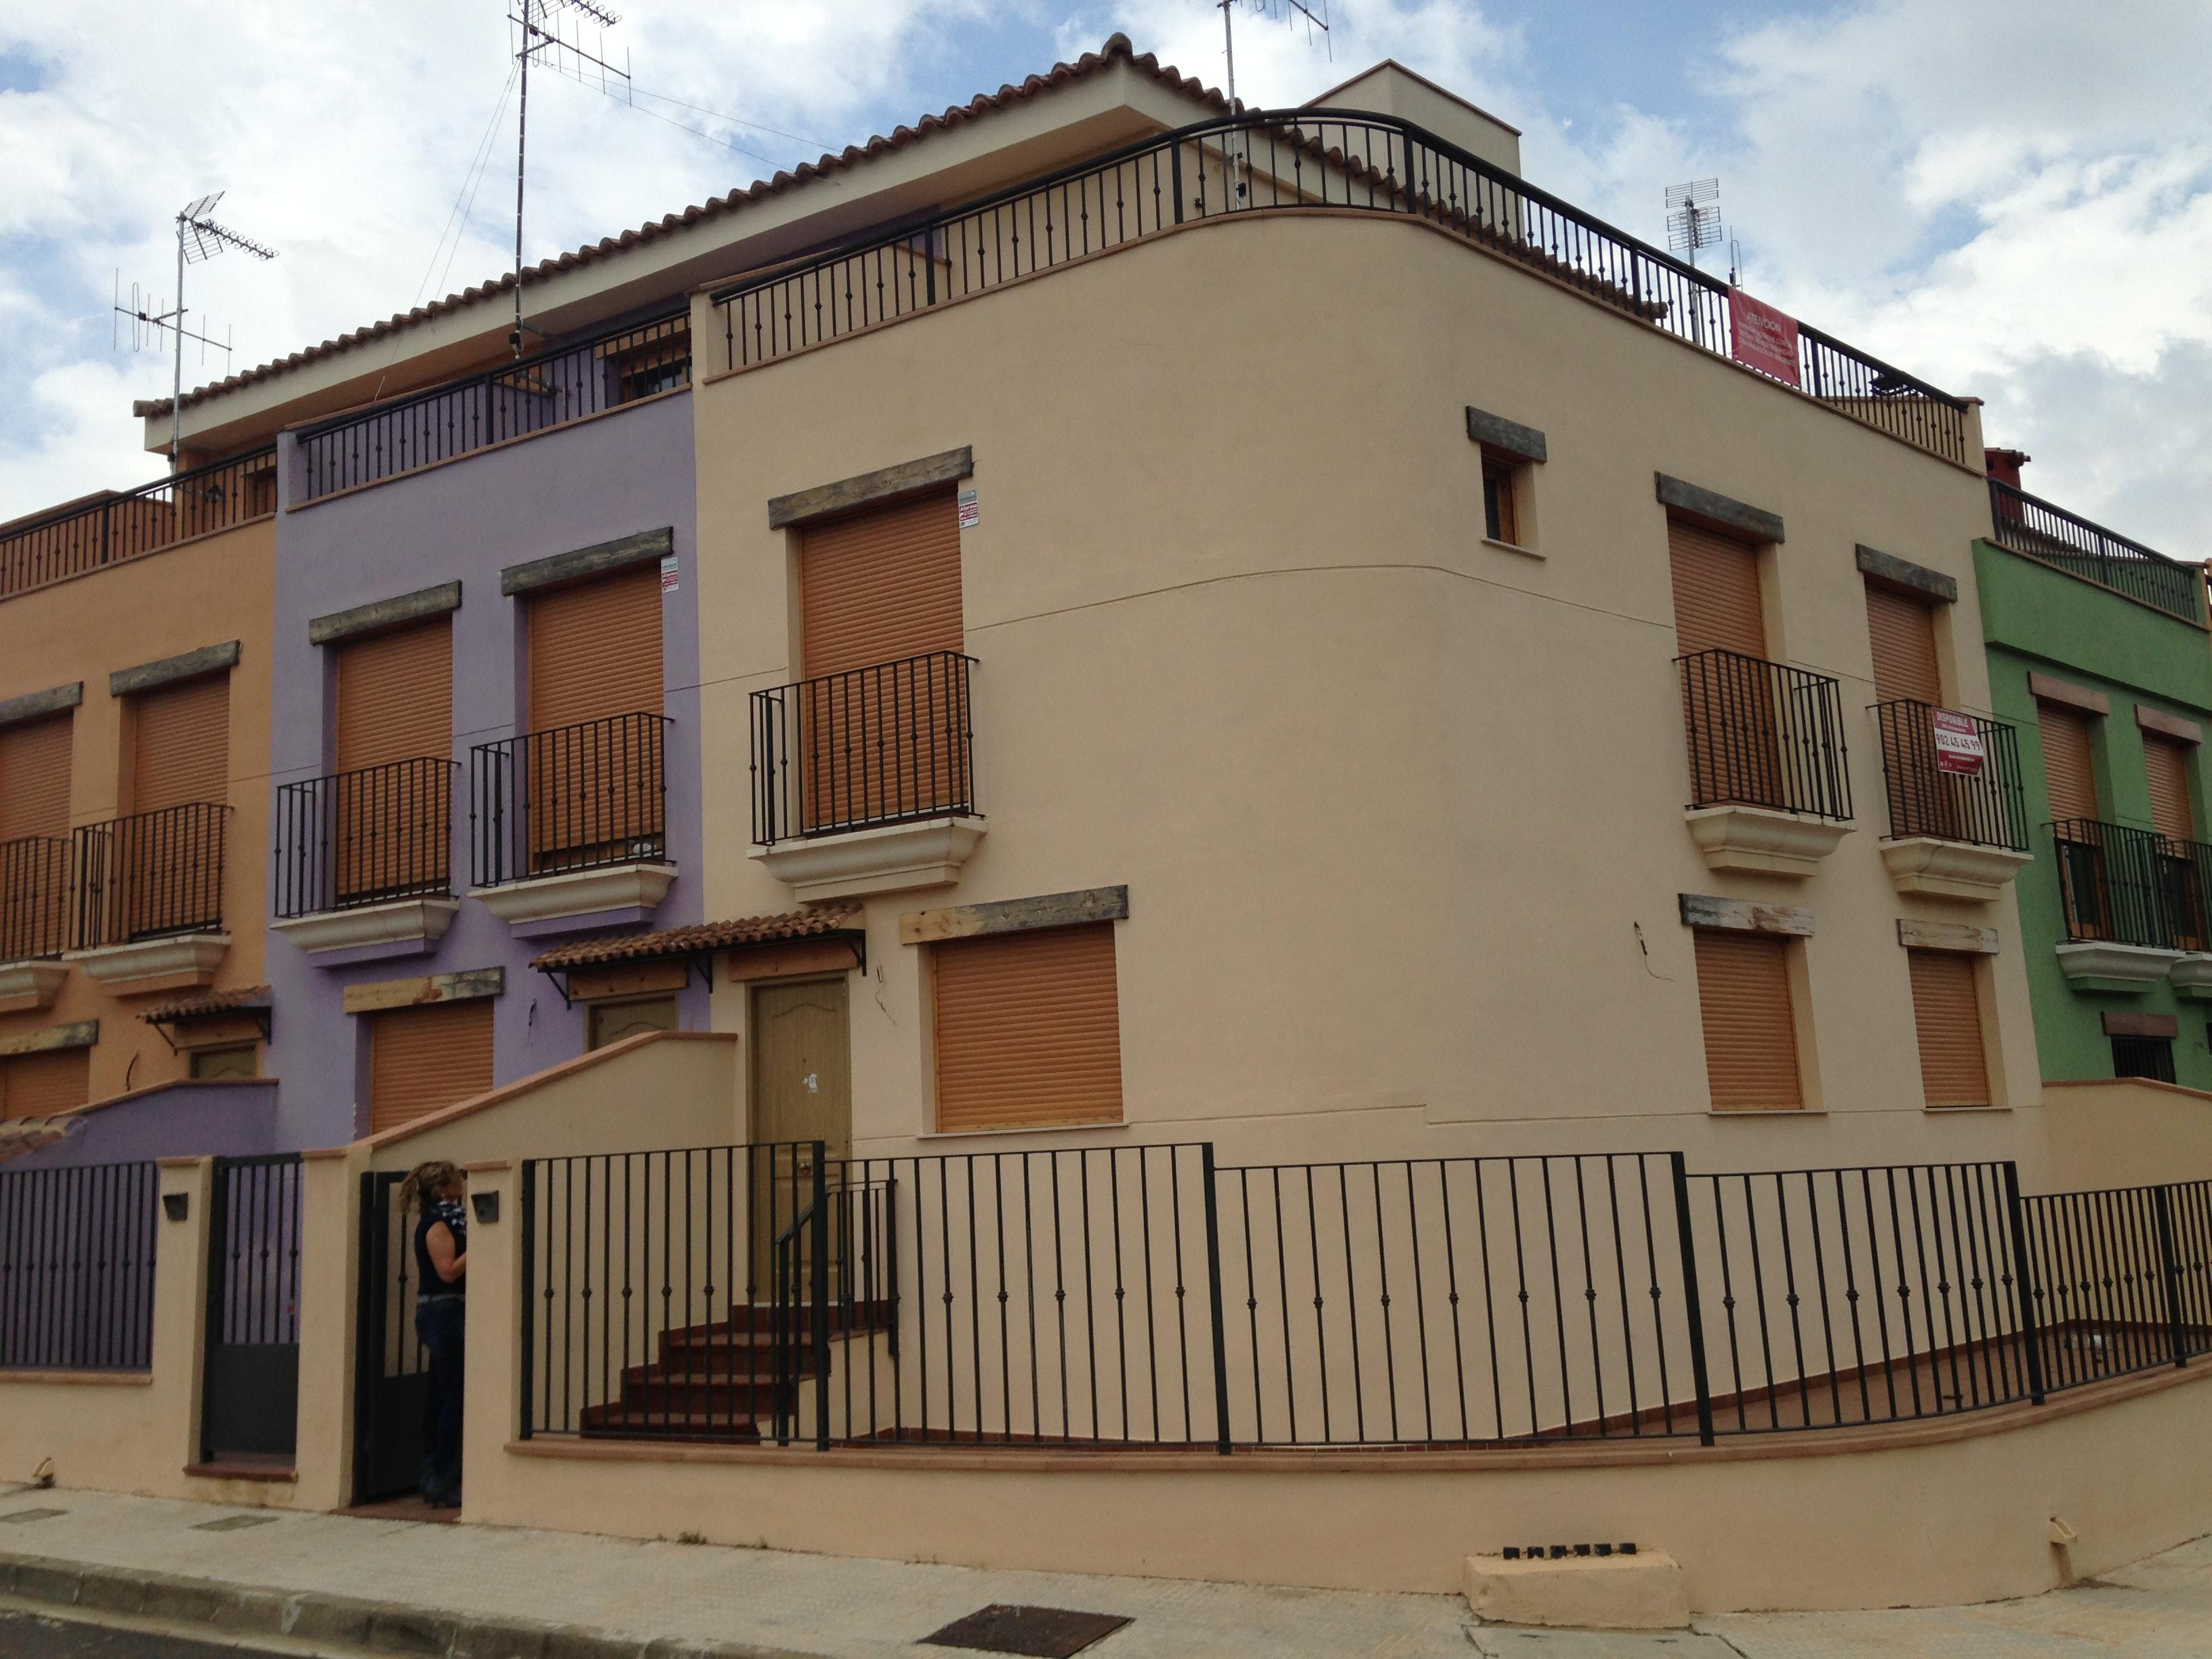 Casa en venta en Urbanización Nueva Onda, Onda, Castellón, Calle Vicenta Ferrer Escriva, 114.000 €, 153 m2